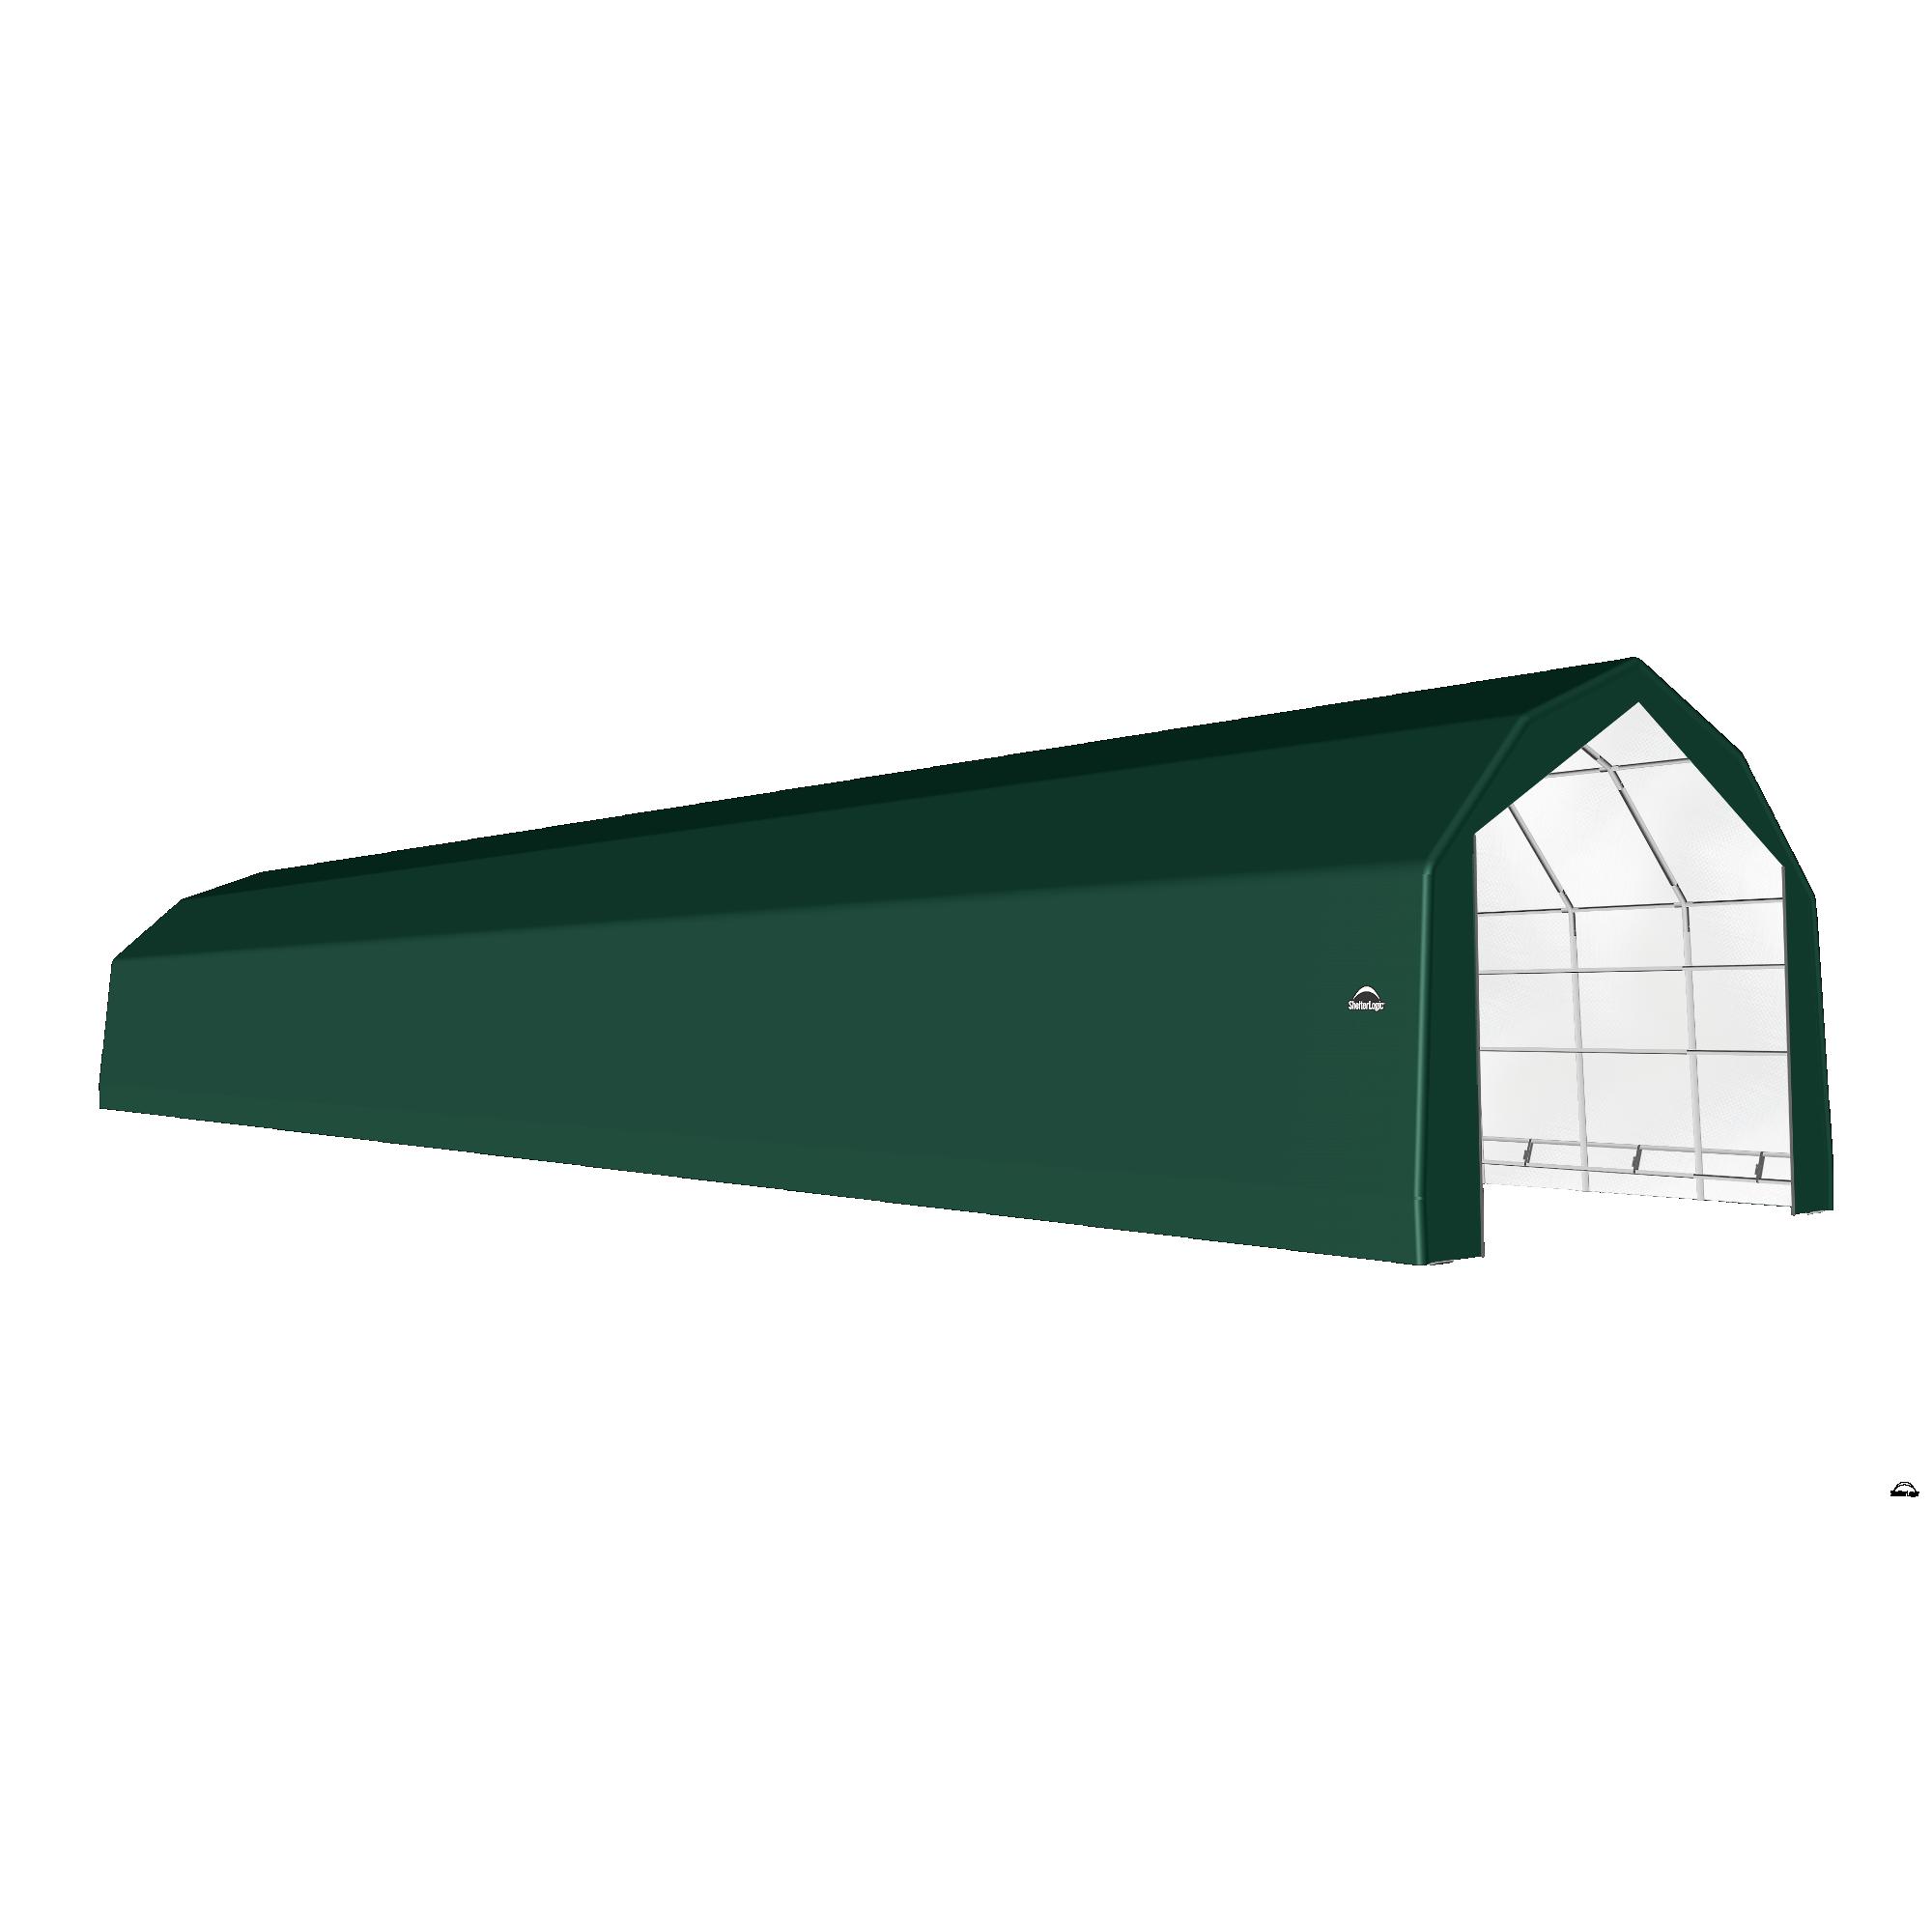 SP Barn 20X92X15 Green 14 oz PE Shelter